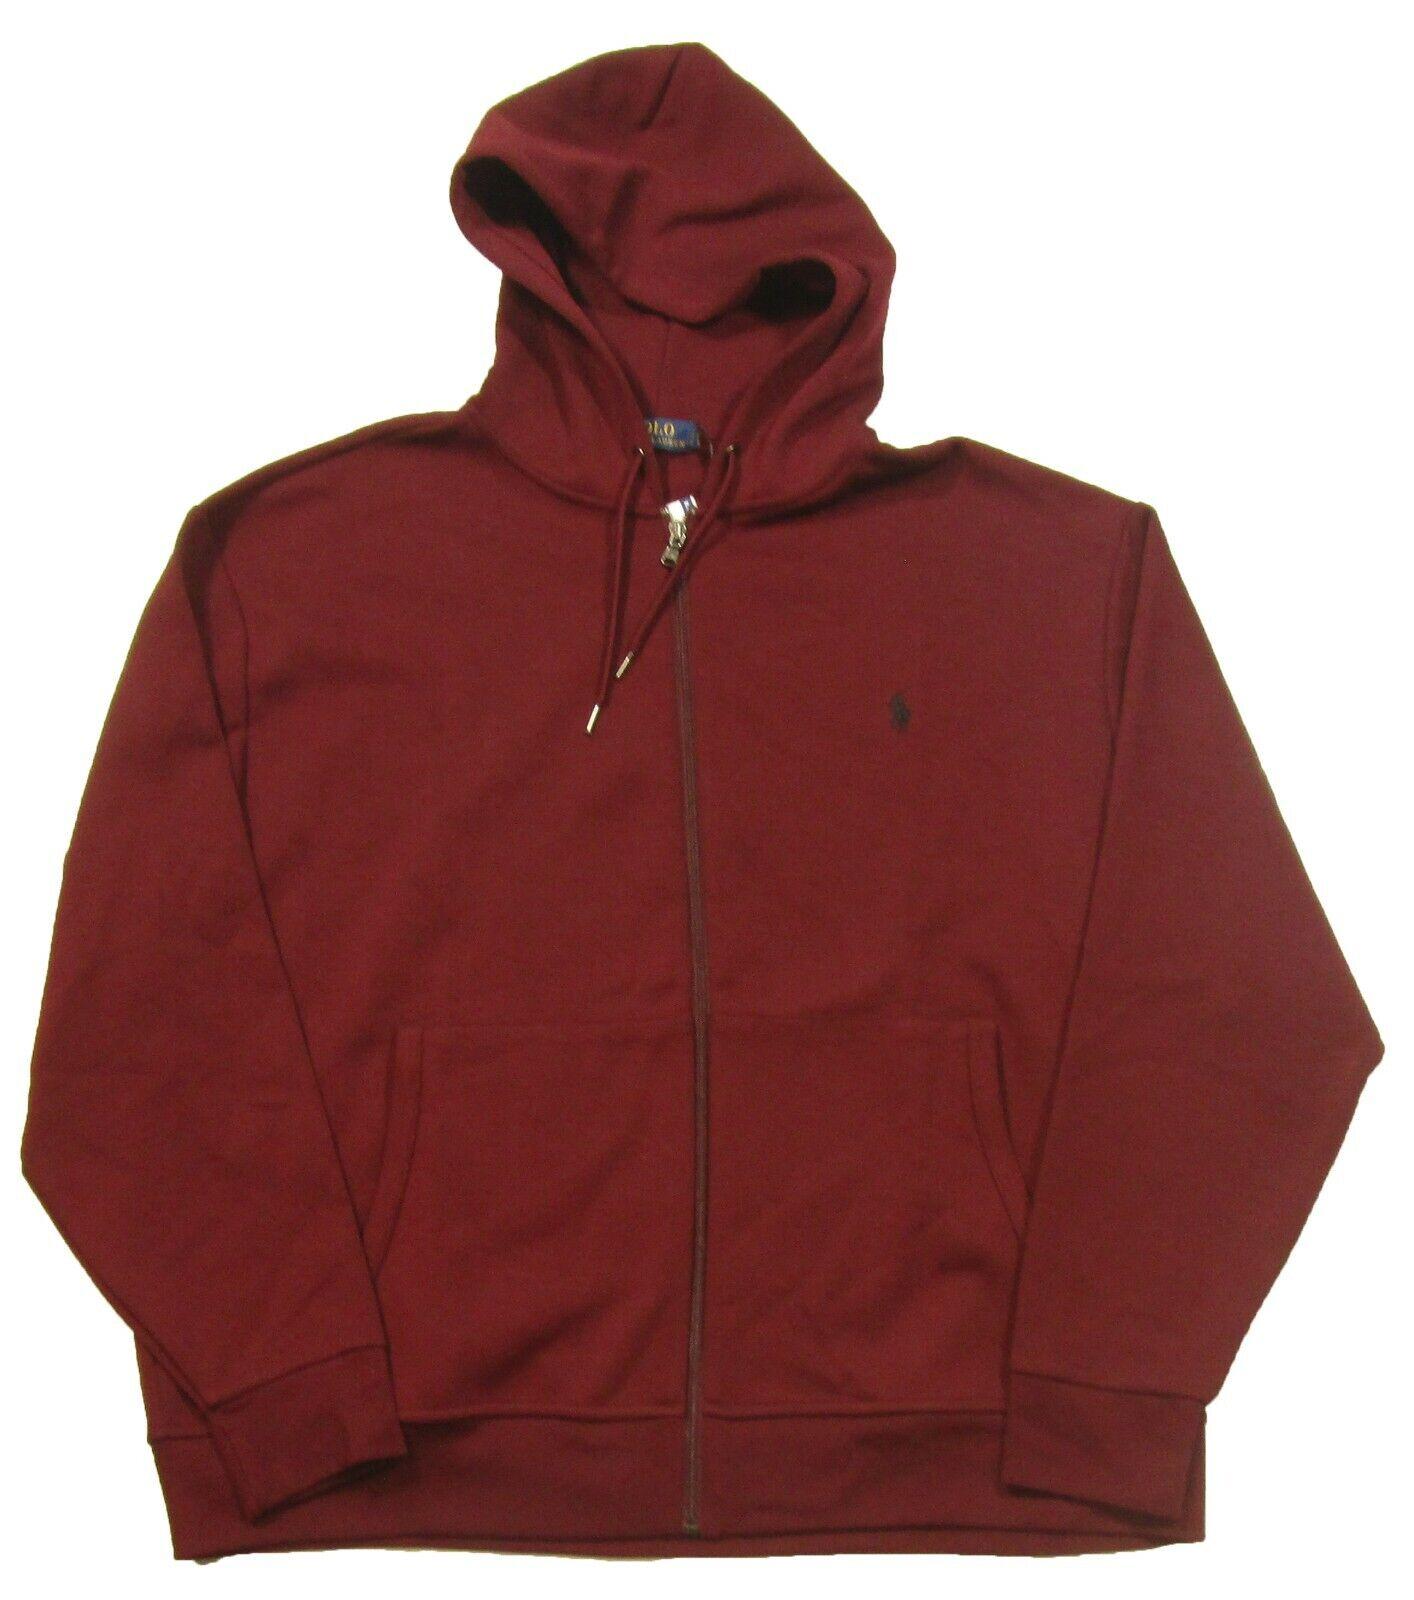 Polo Ralph Lauren Big & Tall Men's Burgundy Red Double Knit Full Zip Hoodie